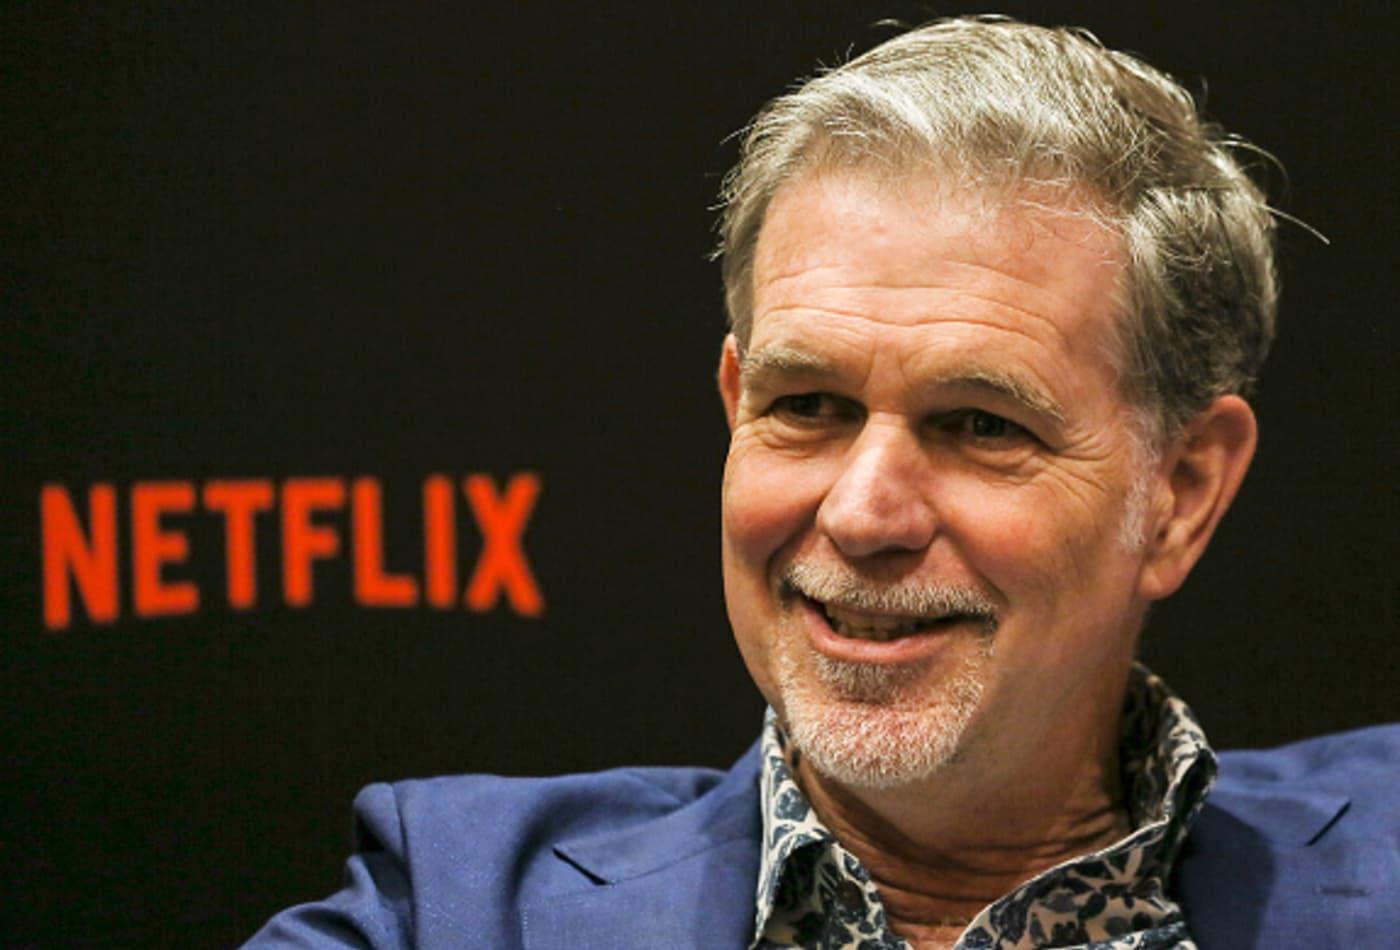 Netflix shares rise slightly despite weak guidance, domestic subscriber miss